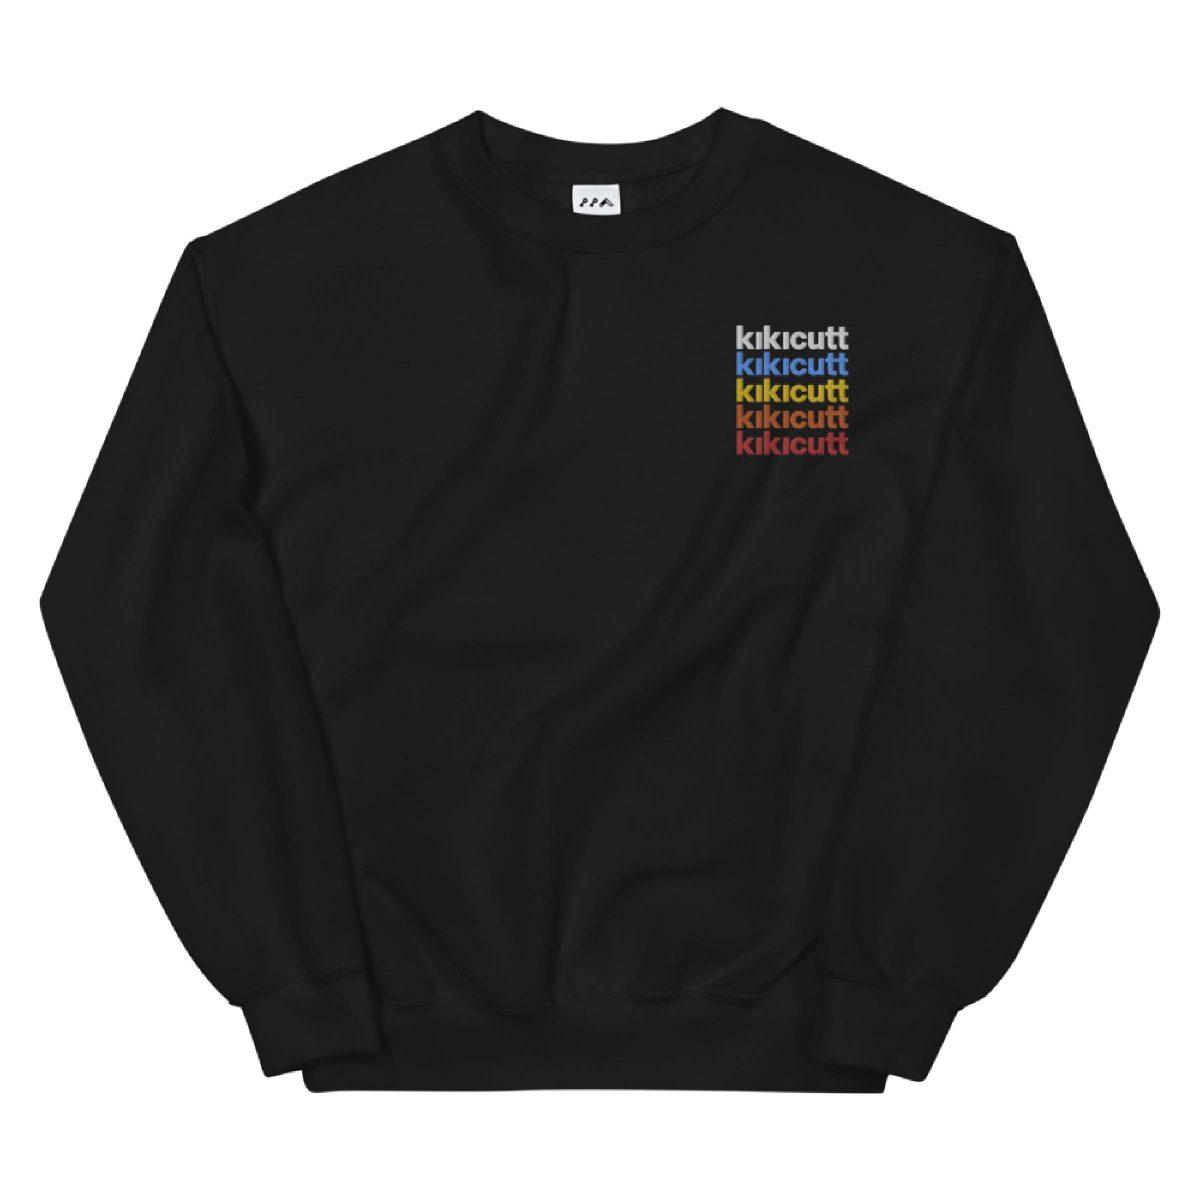 KIKICUTT RAINBOW sweatshirt by kikicutt sweatshirt store